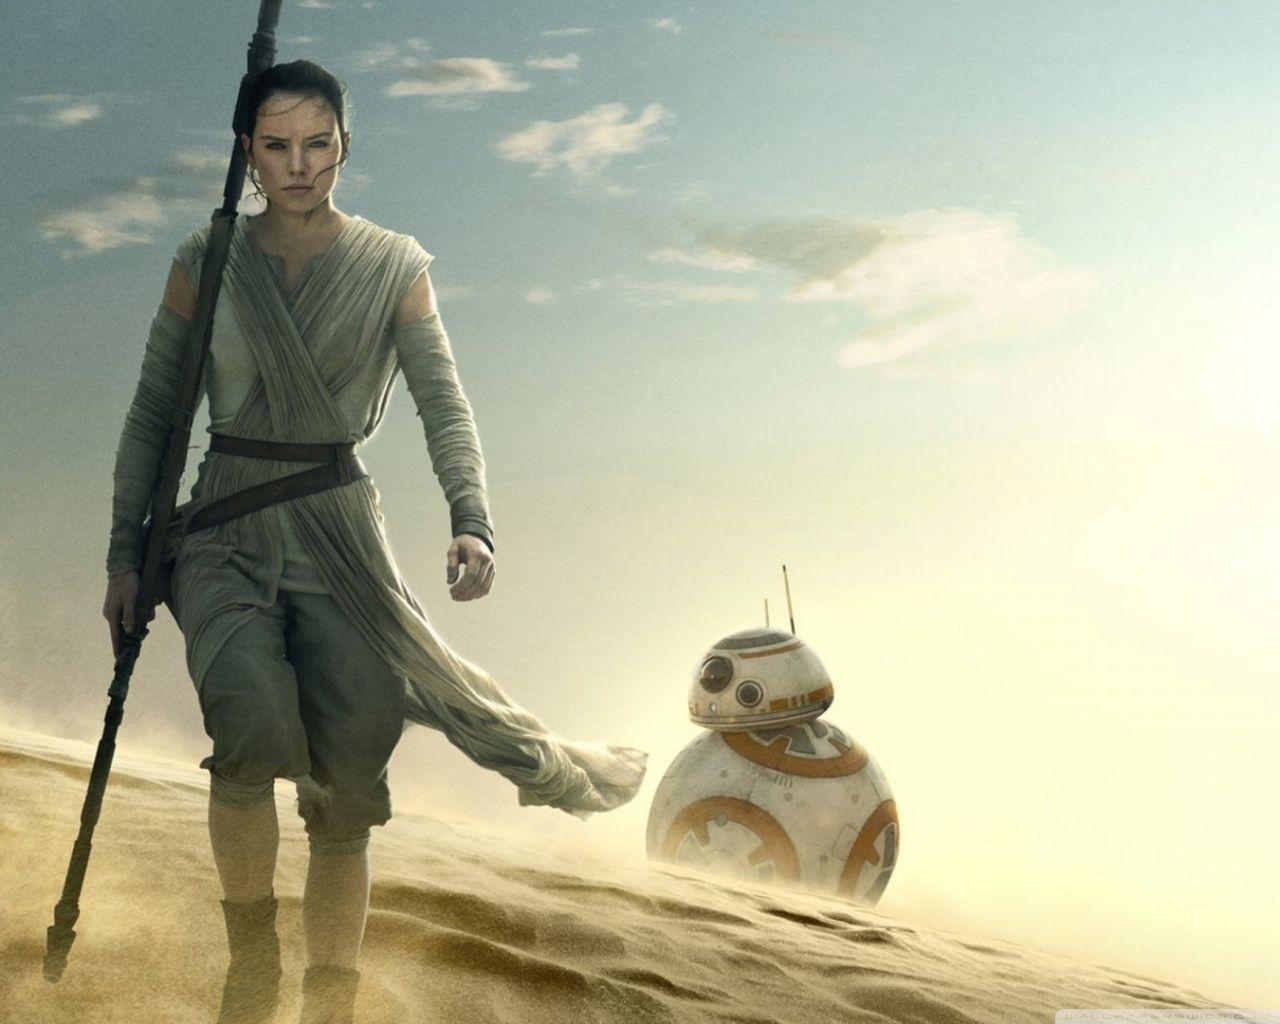 Star Wars Rey Wallpapers Top Free Star Wars Rey Backgrounds Wallpaperaccess